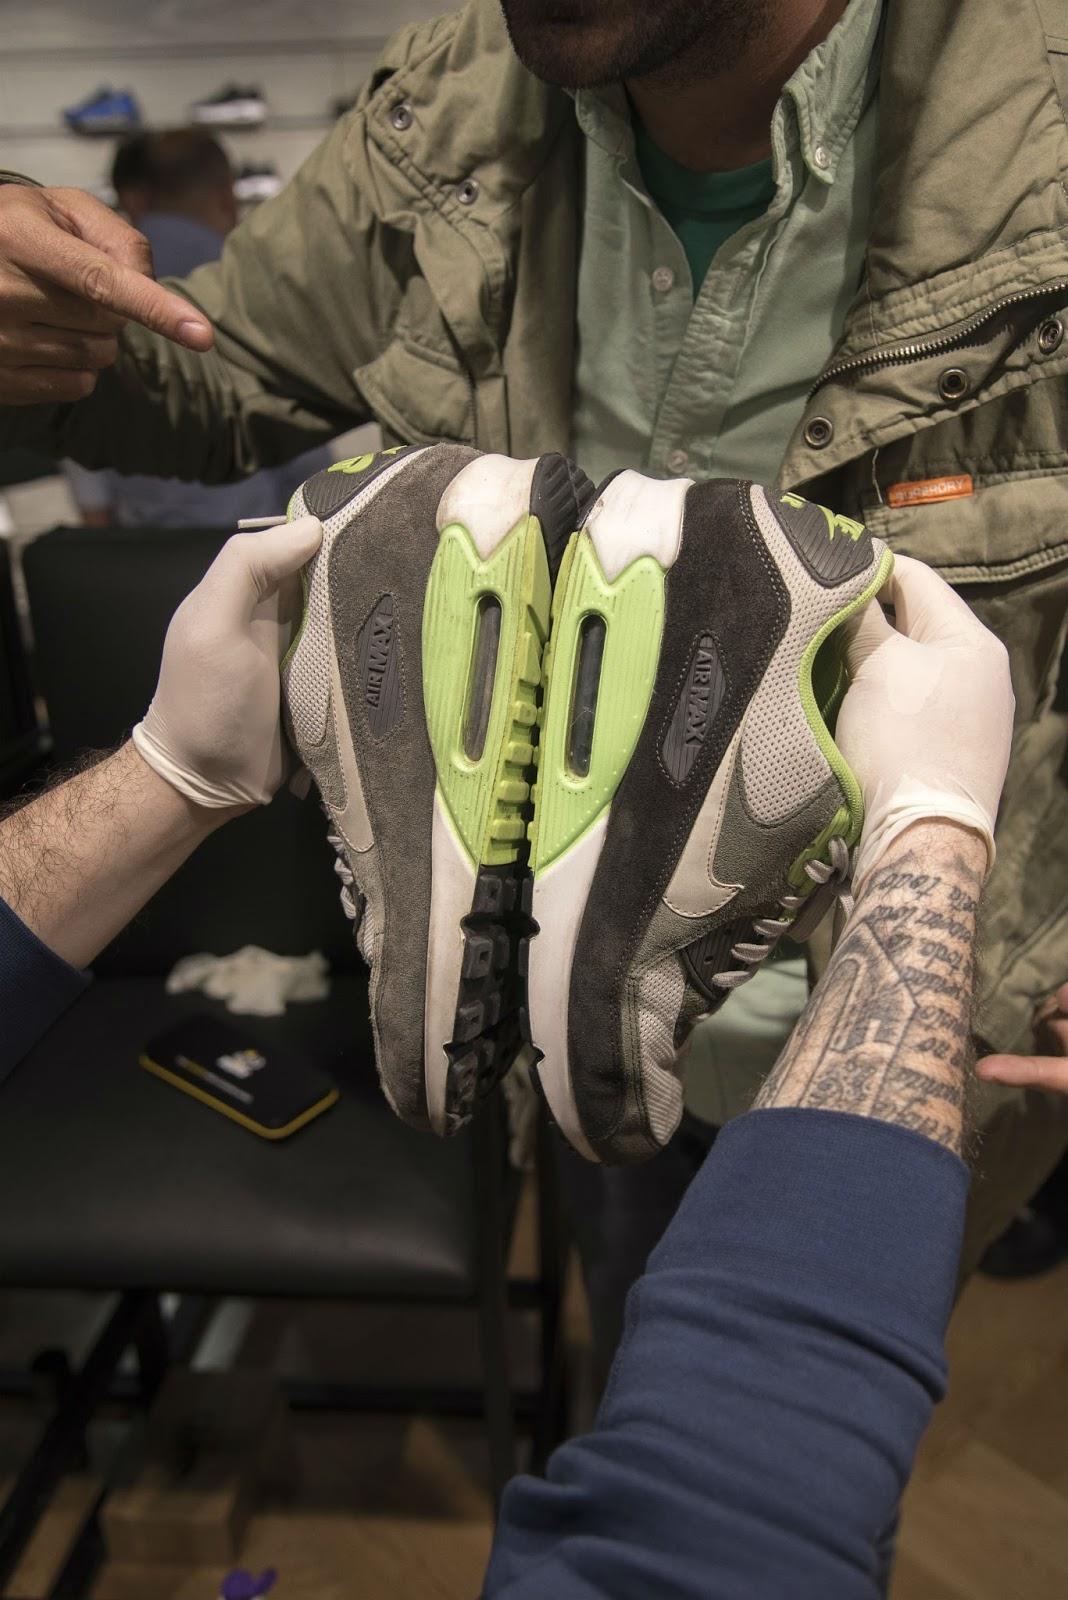 TiendaKicks Lounge Estilo De En Un Por Nike Apuesta El Nuevo 1uTKJc3Fl